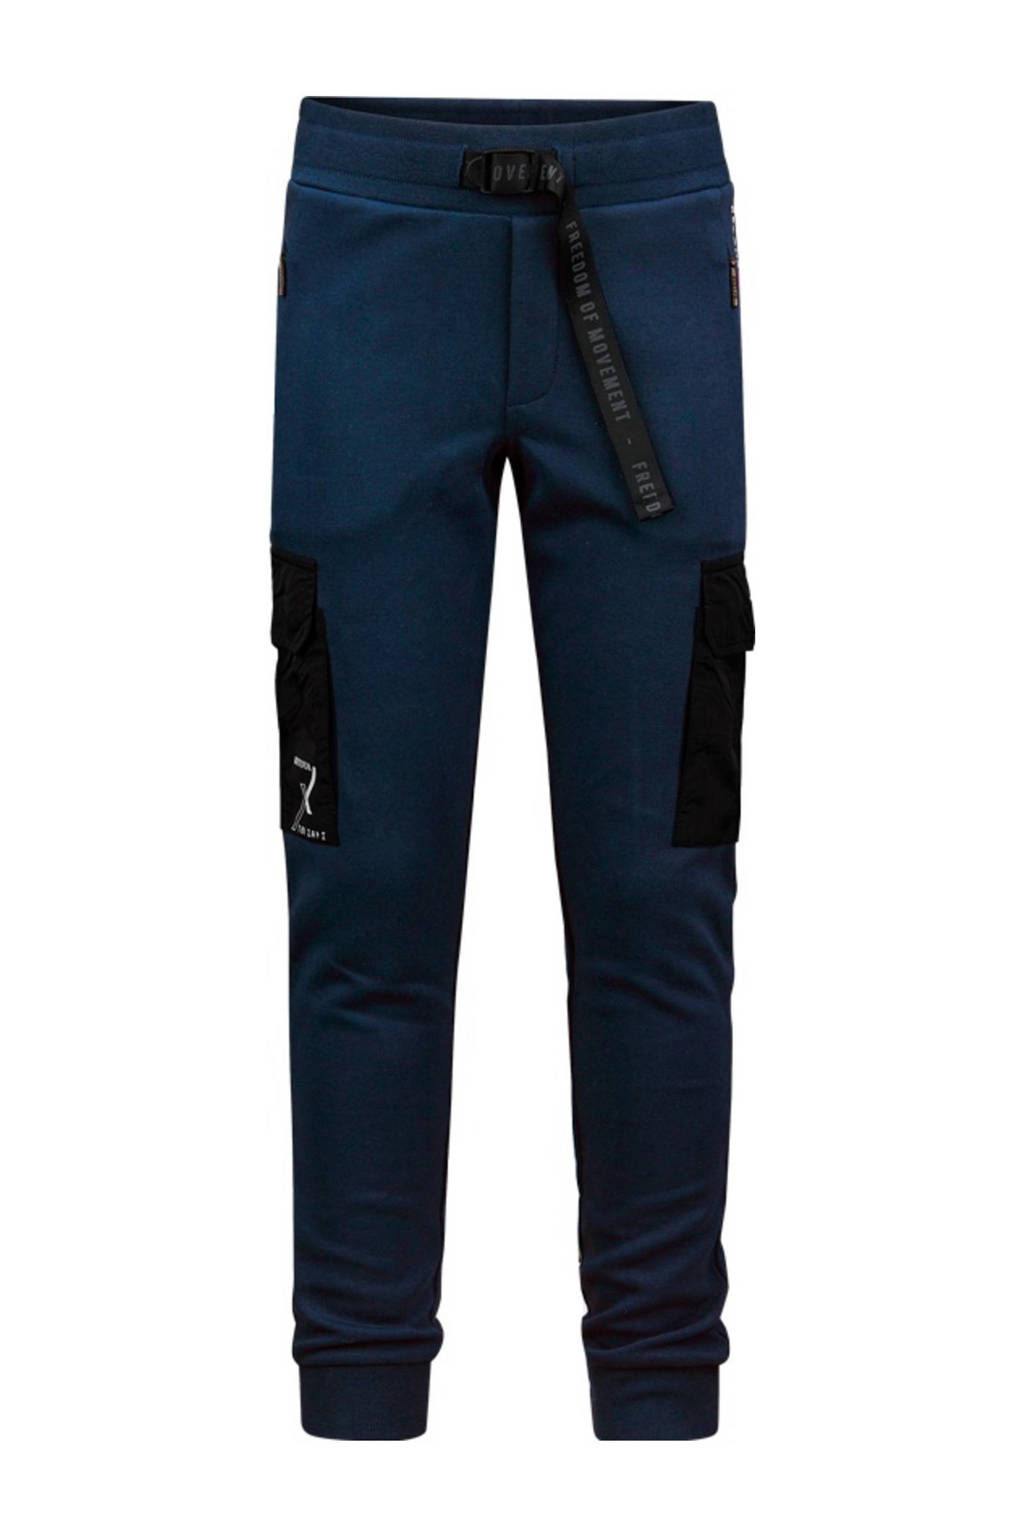 Retour Denim Retour Jeans x Touzani joggingbroek Kick donkerblauw, Donkerblauw